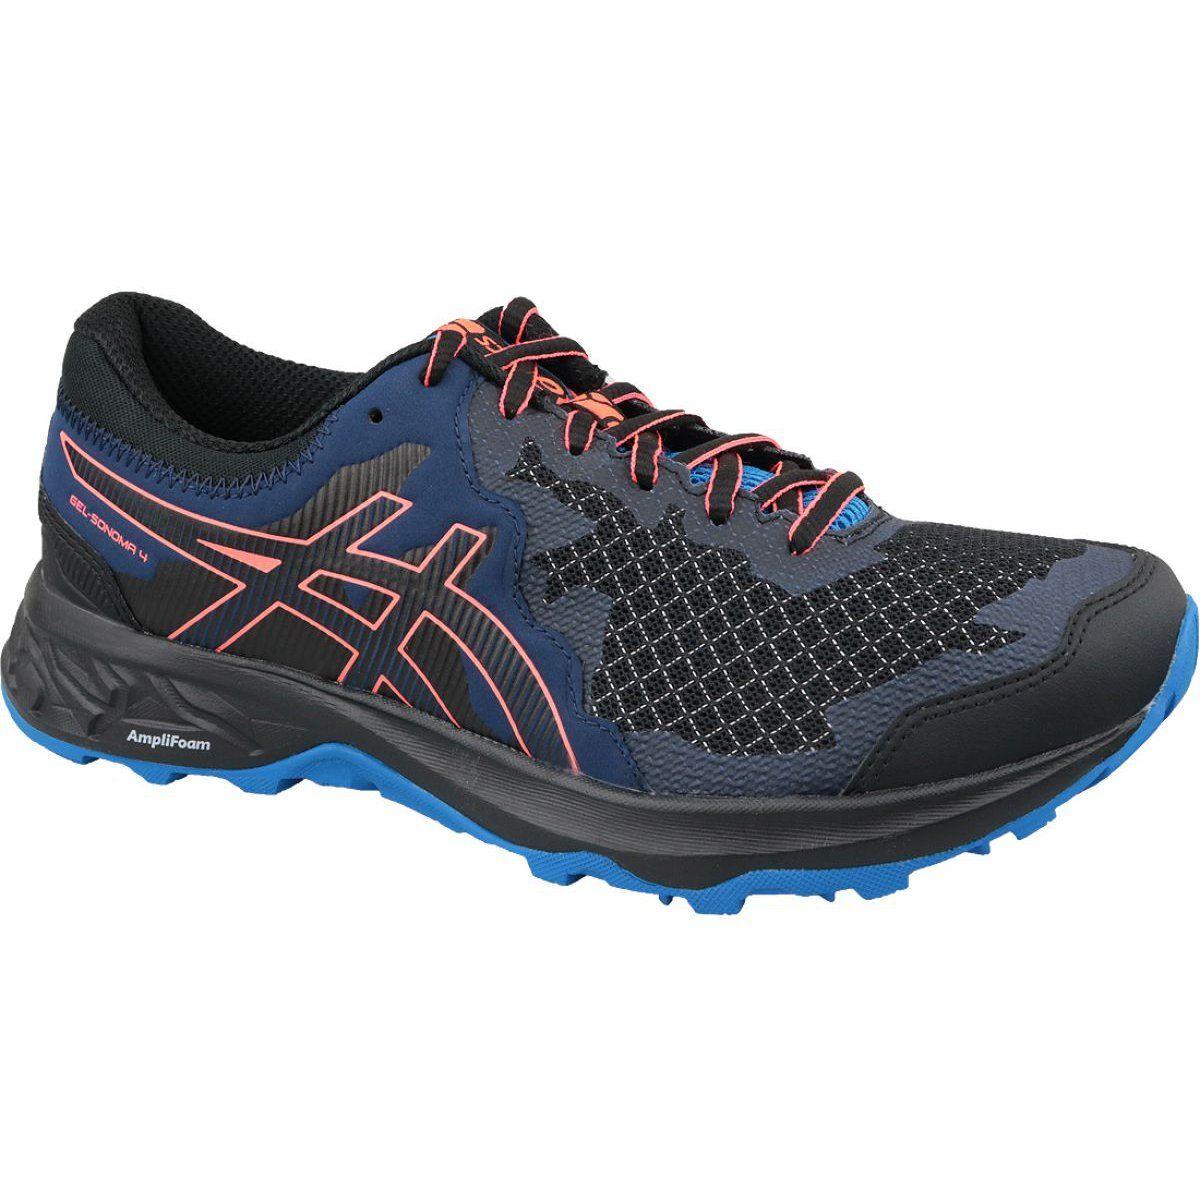 Buty Biegowe Asics Gel Sonoma 4 1011a177 003 Granatowe Wielokolorowe Asics Running Shoes Running Shoes Best Running Shoes